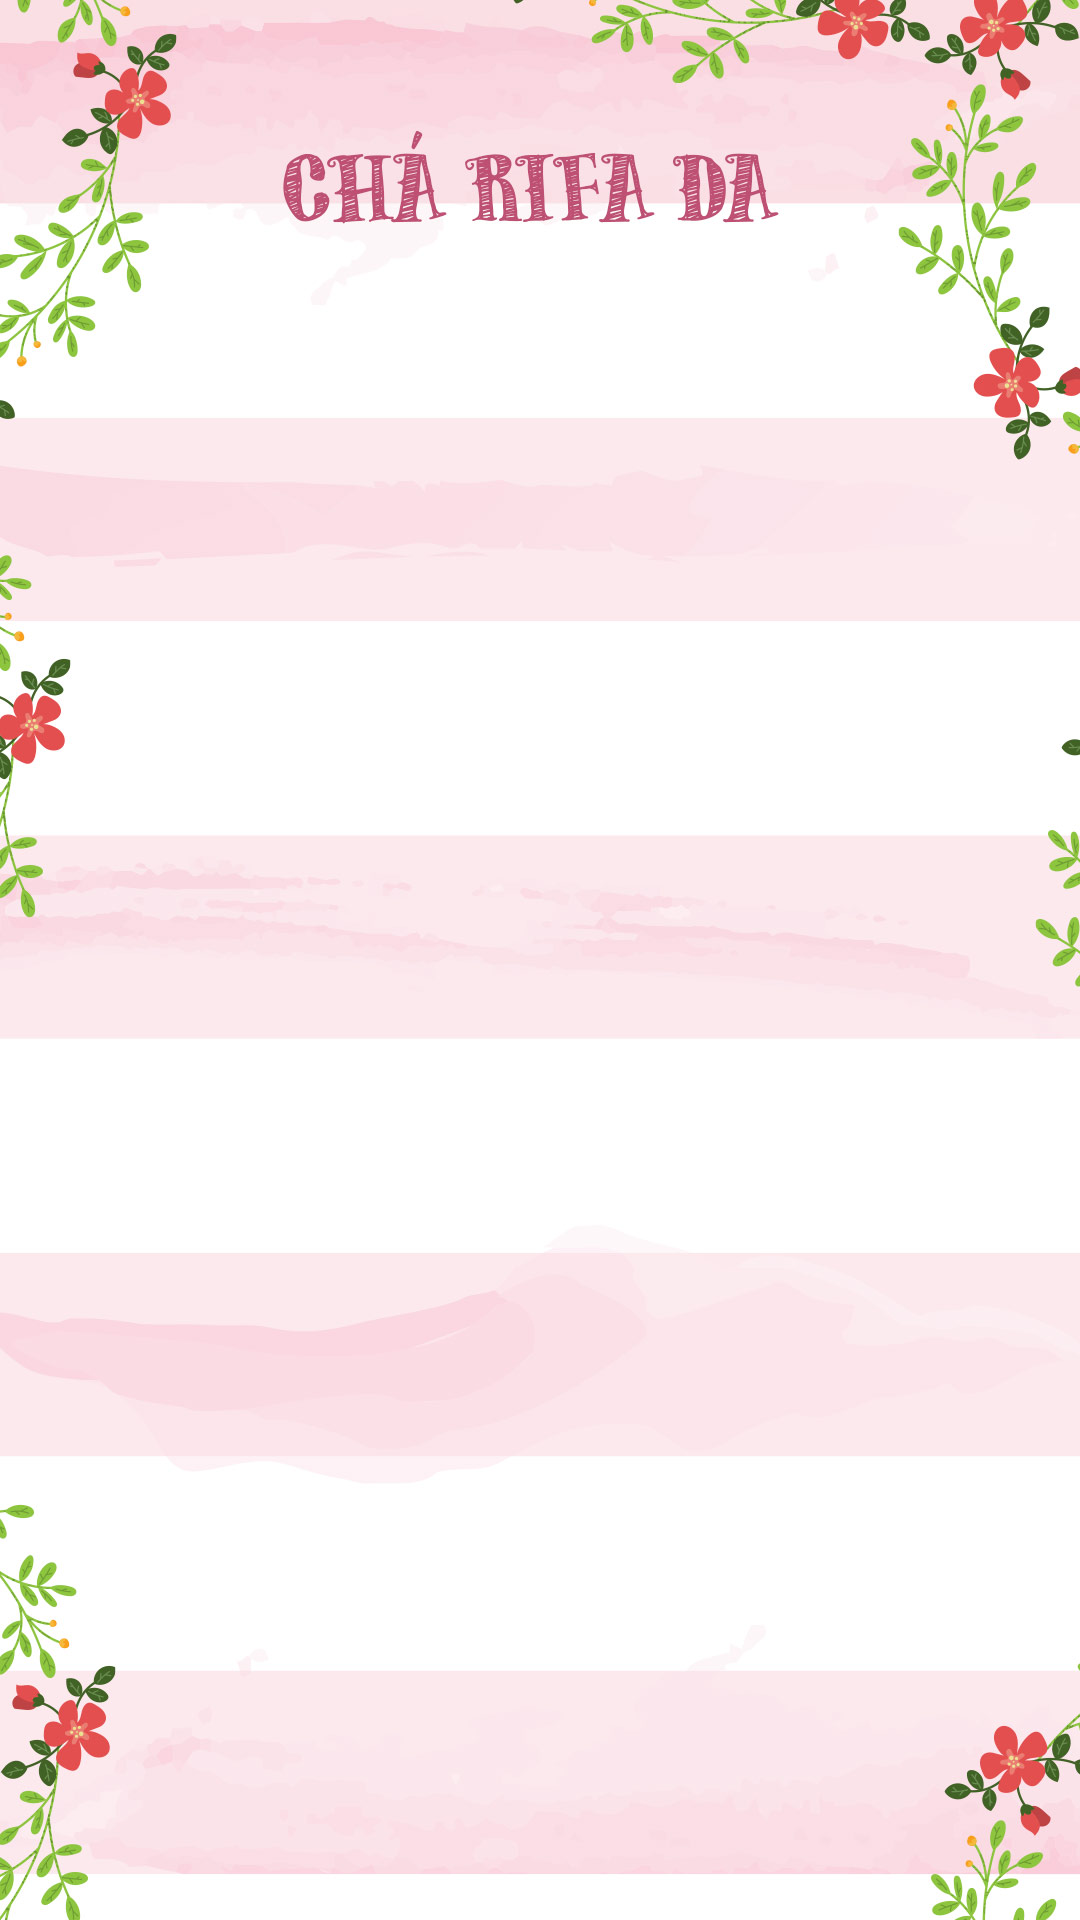 Cartela Rifa Floral